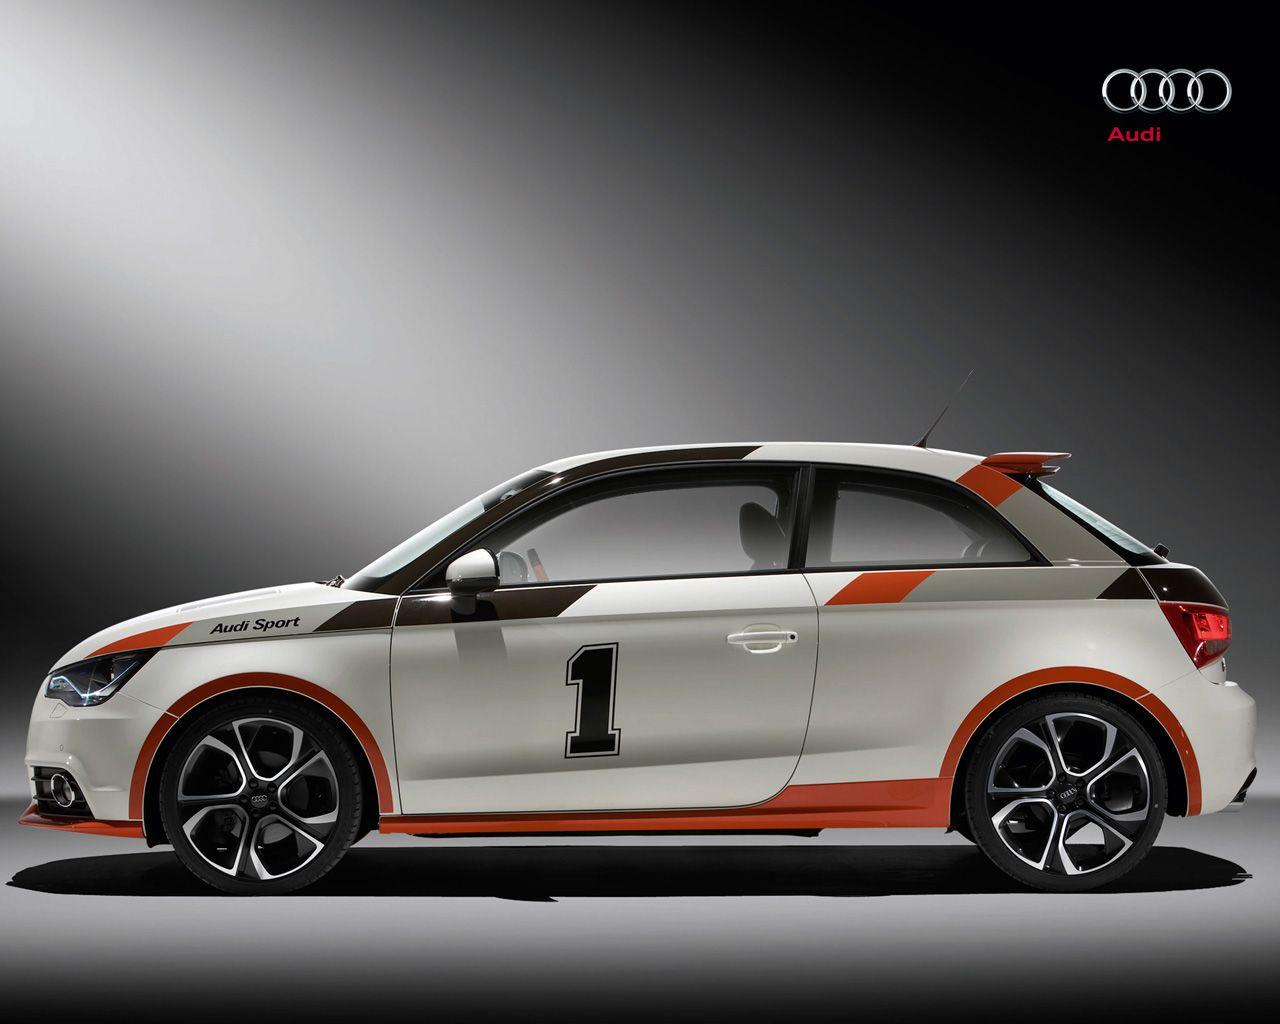 Car sticker design competition - Audi A1 Competition Kit